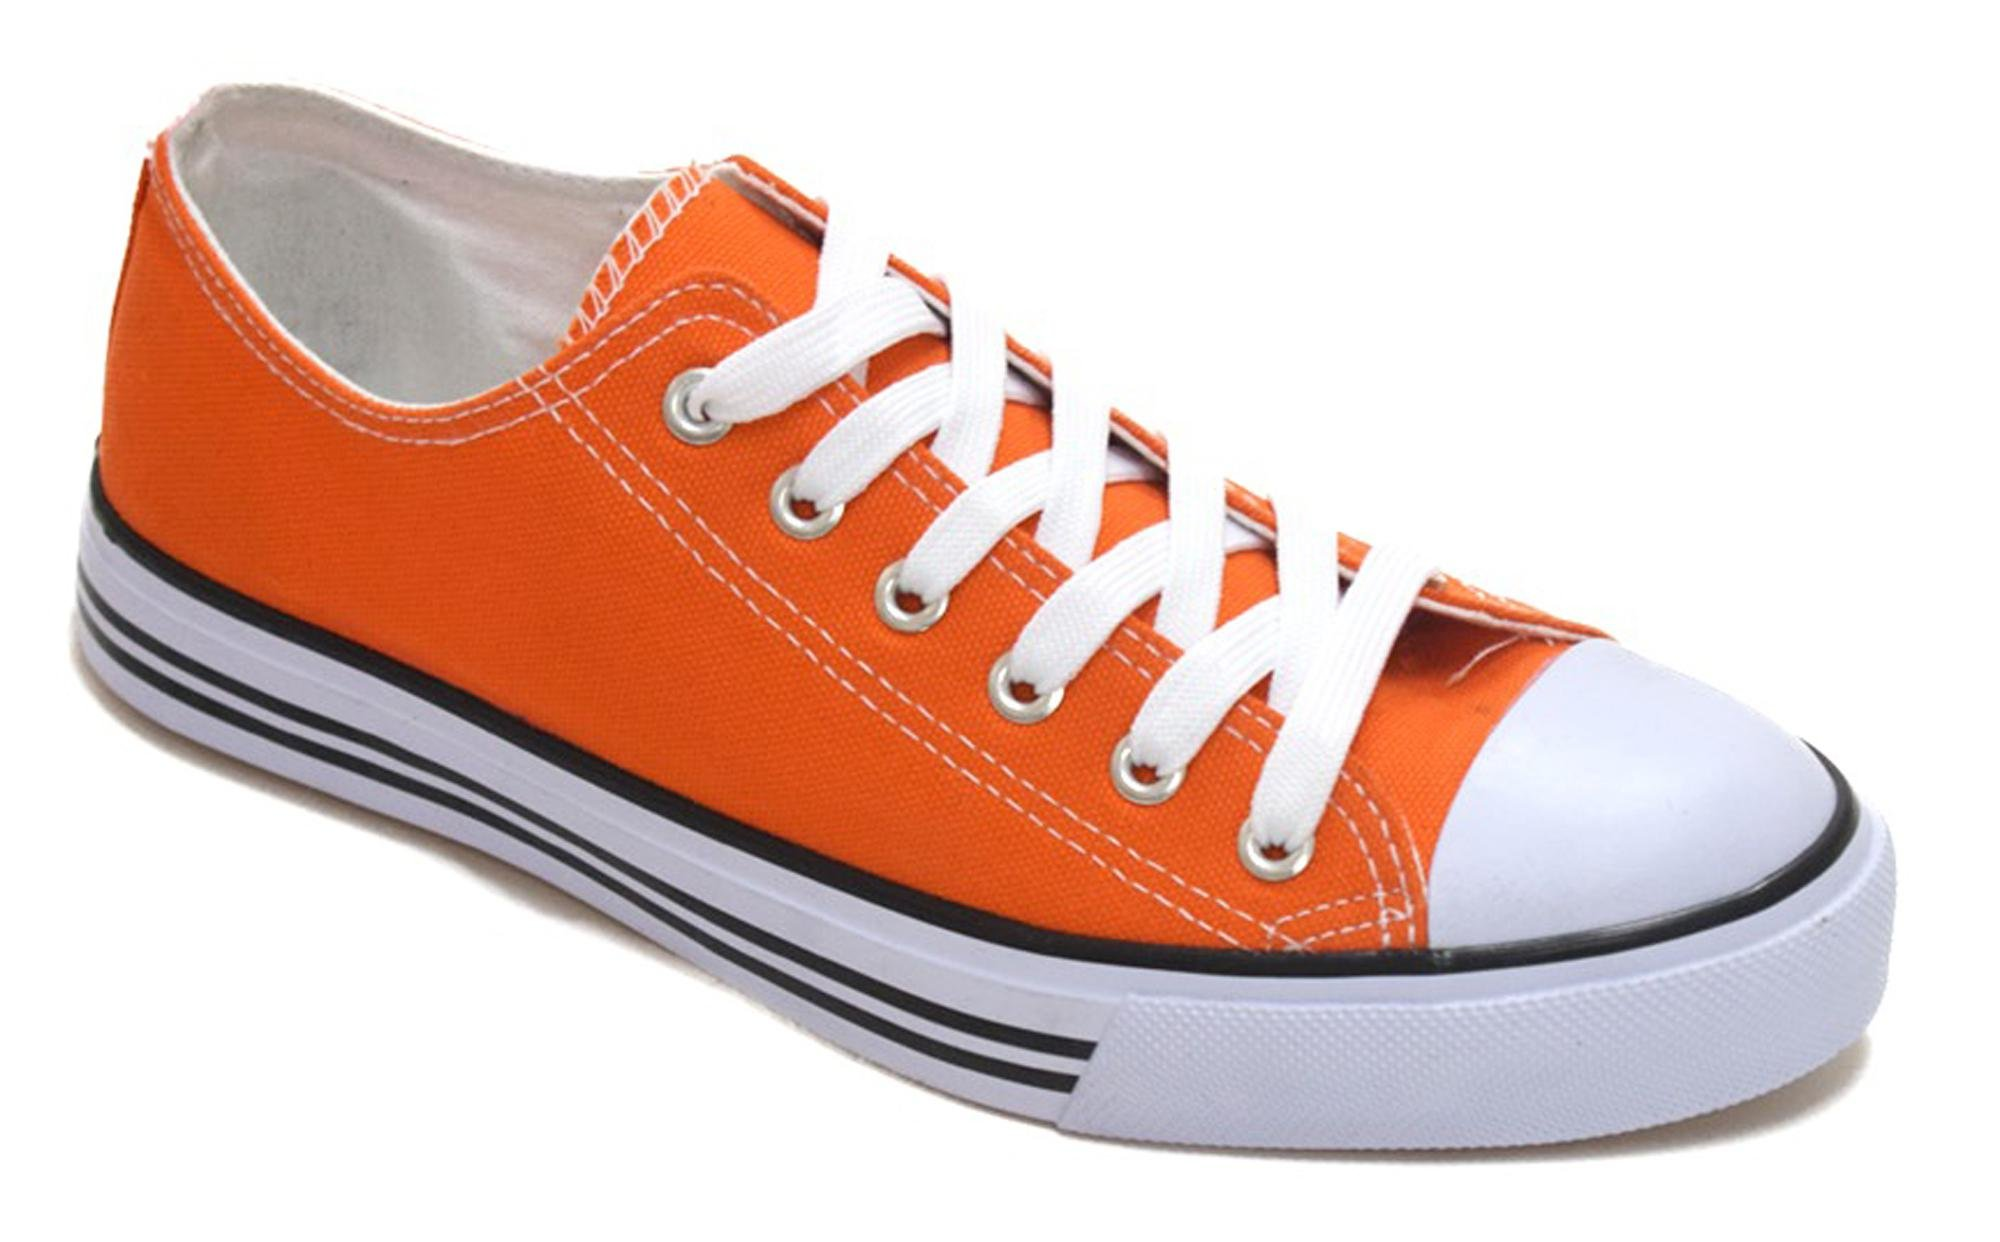 Haughty Canvas Shoes for Women Fashion Walking Shoes Ladies Sneaker Low Top Black White (6, Orange)